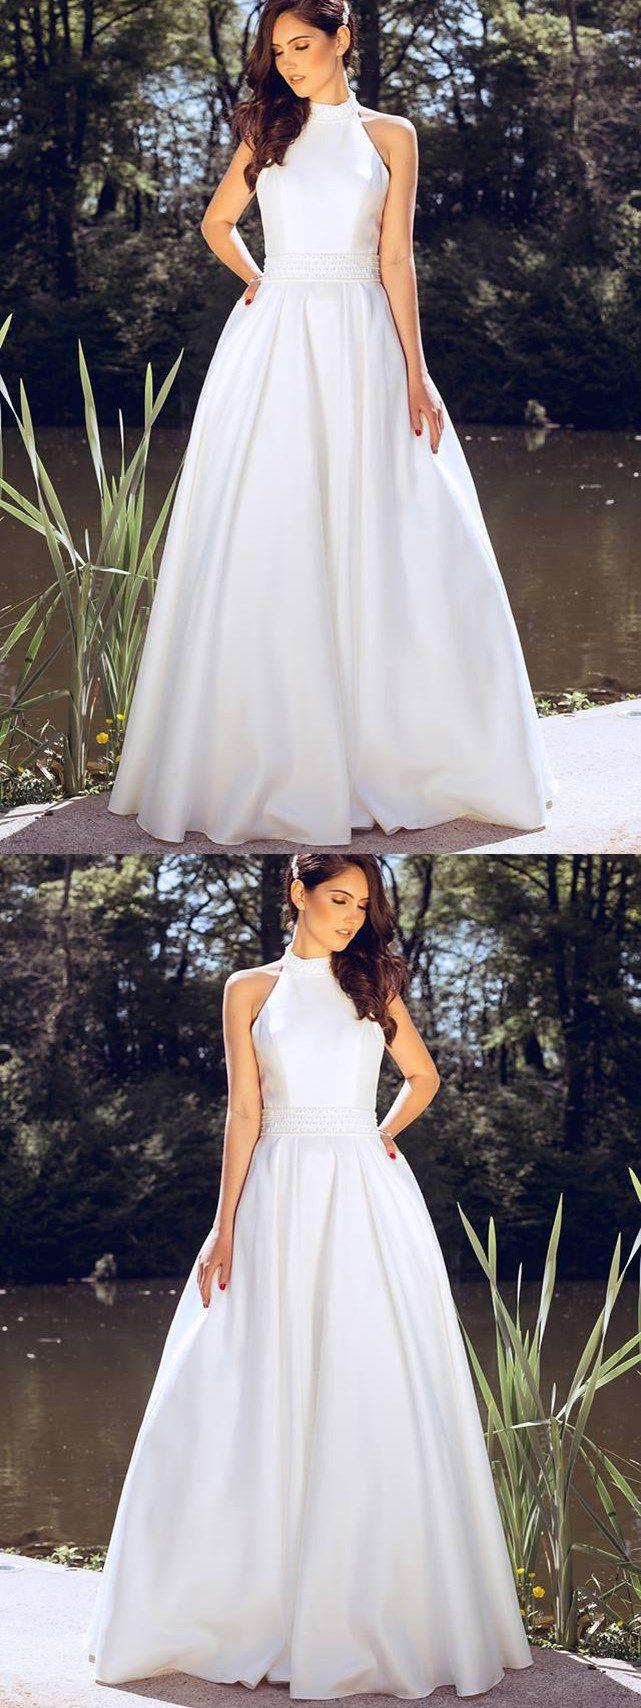 Wedding dresses with beading  Simple Wedding Dresses Floorlength Aline Beading Halter Cheap